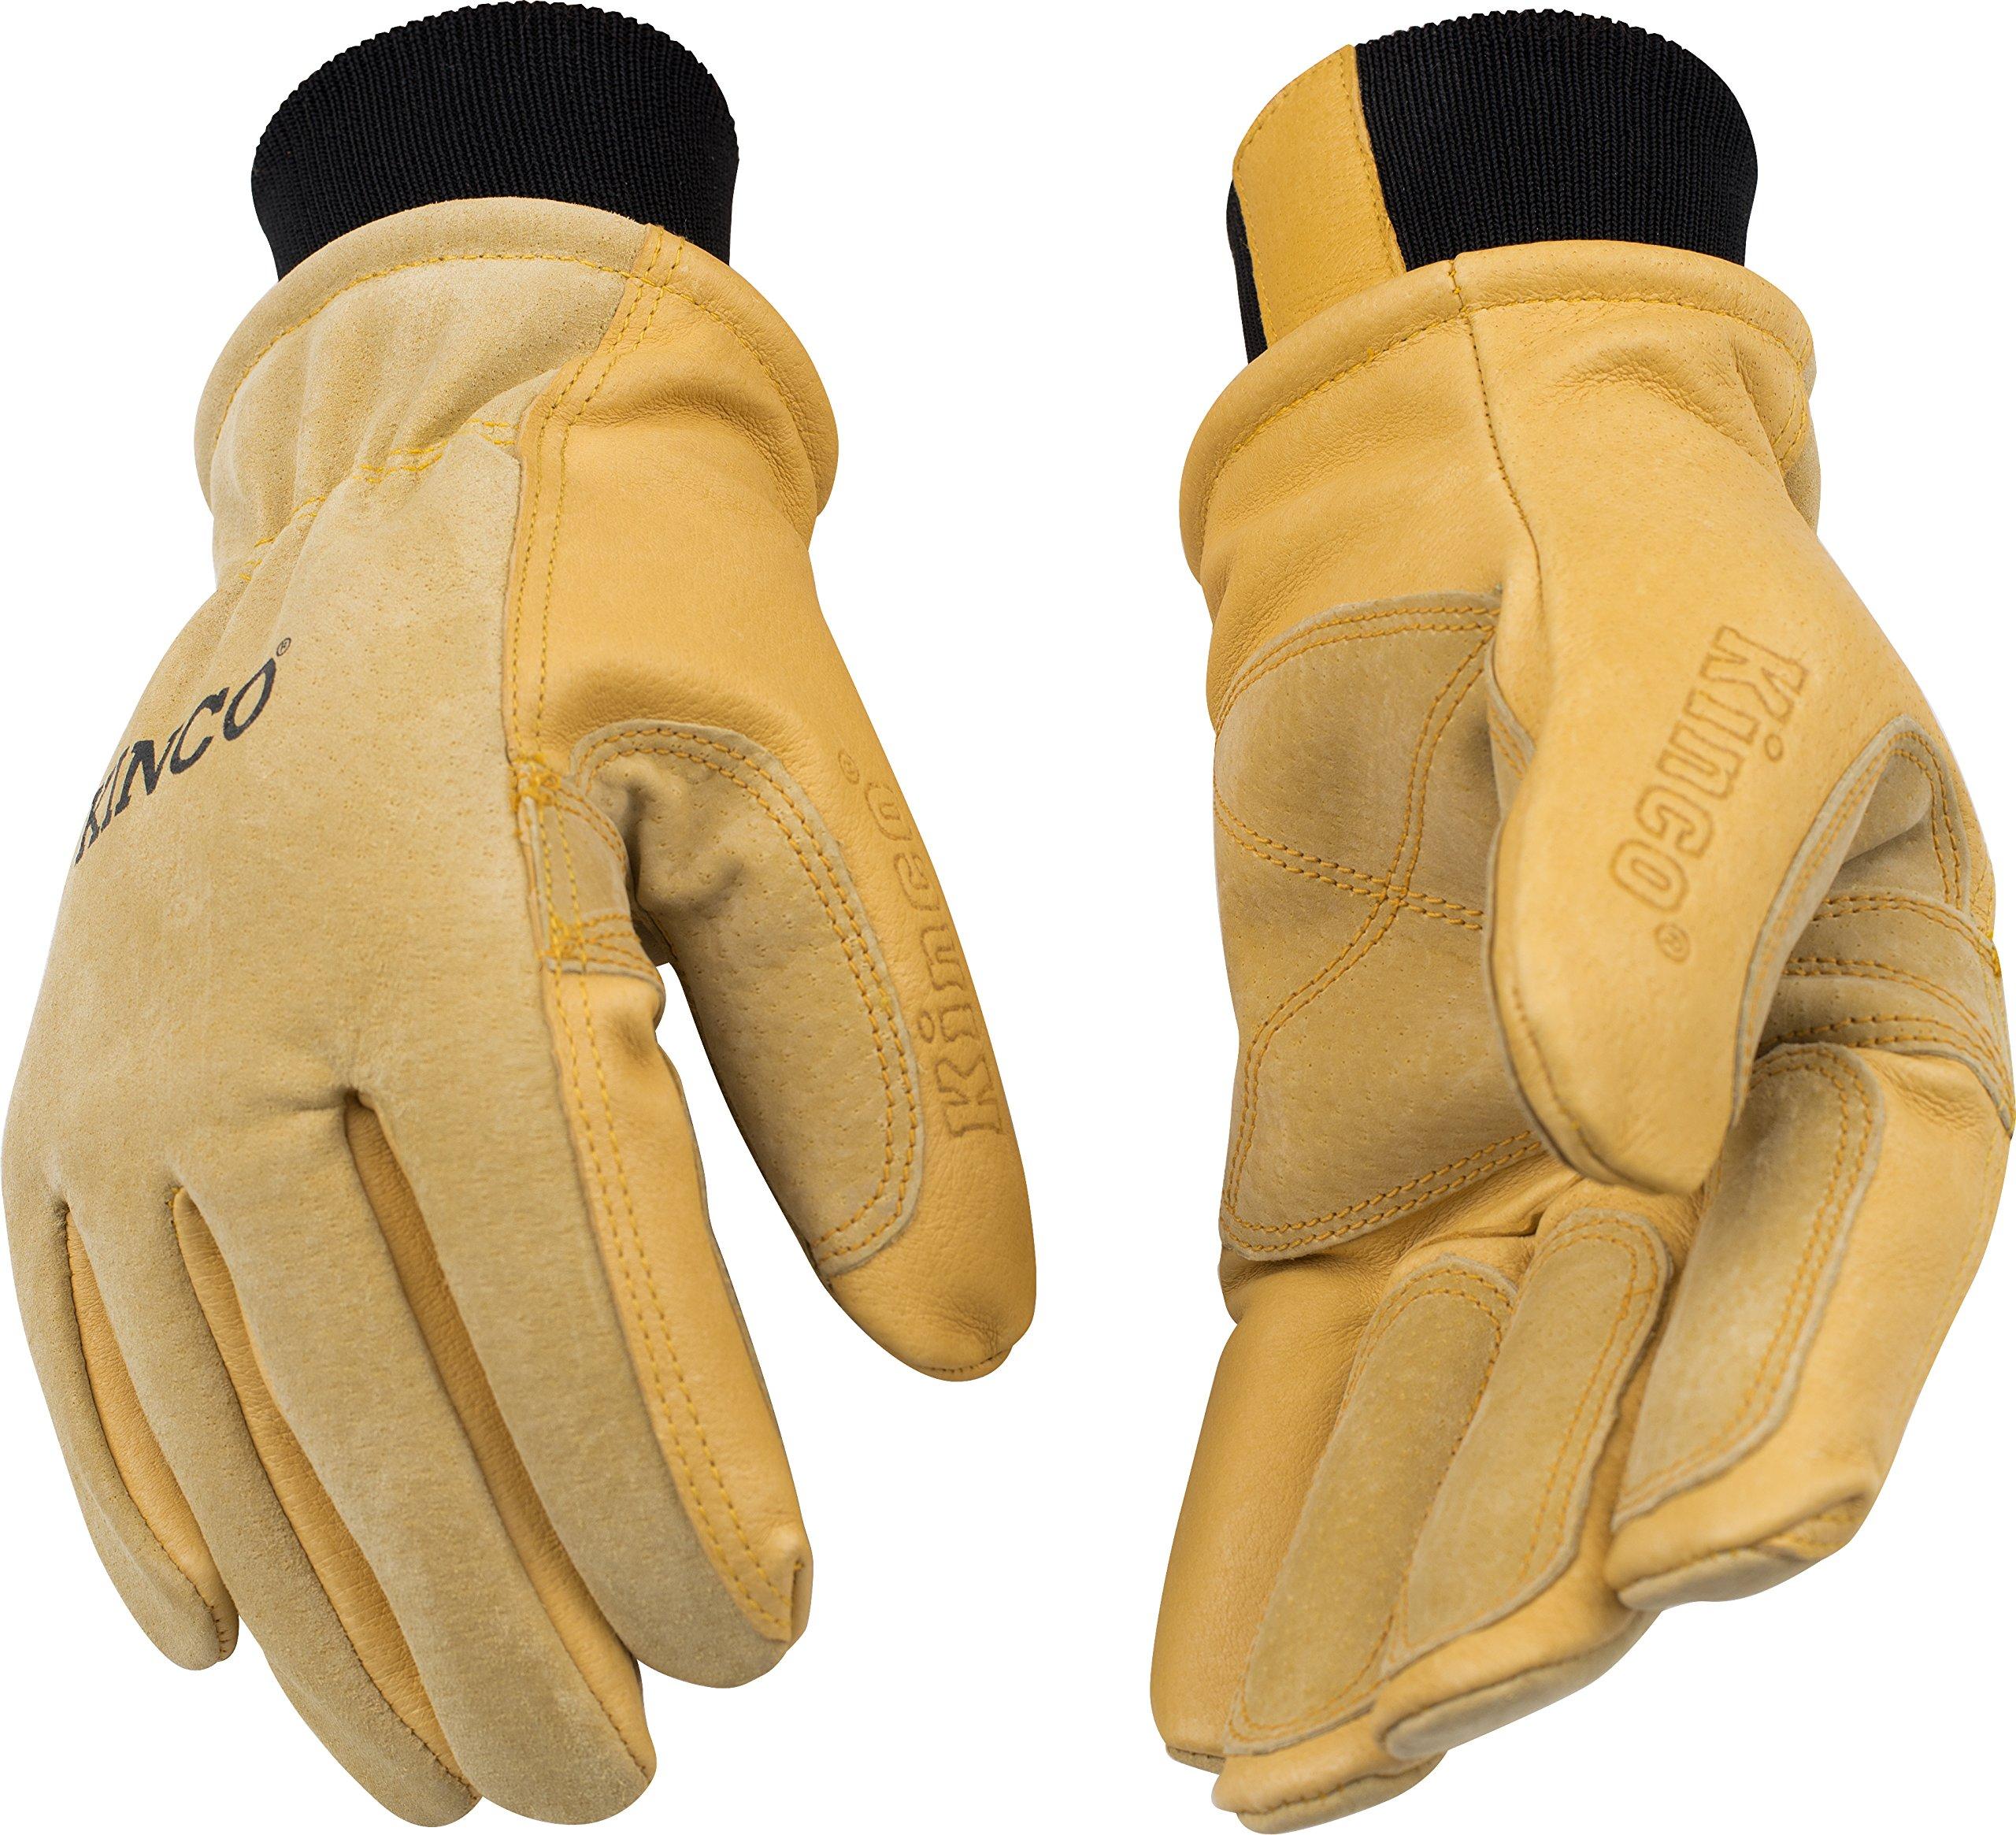 KINCO 901 Men's Pigskin Leather Ski Glove, HeatKeep Thermal Lining, Draylon Thread, X-Large, Golden by Kinco